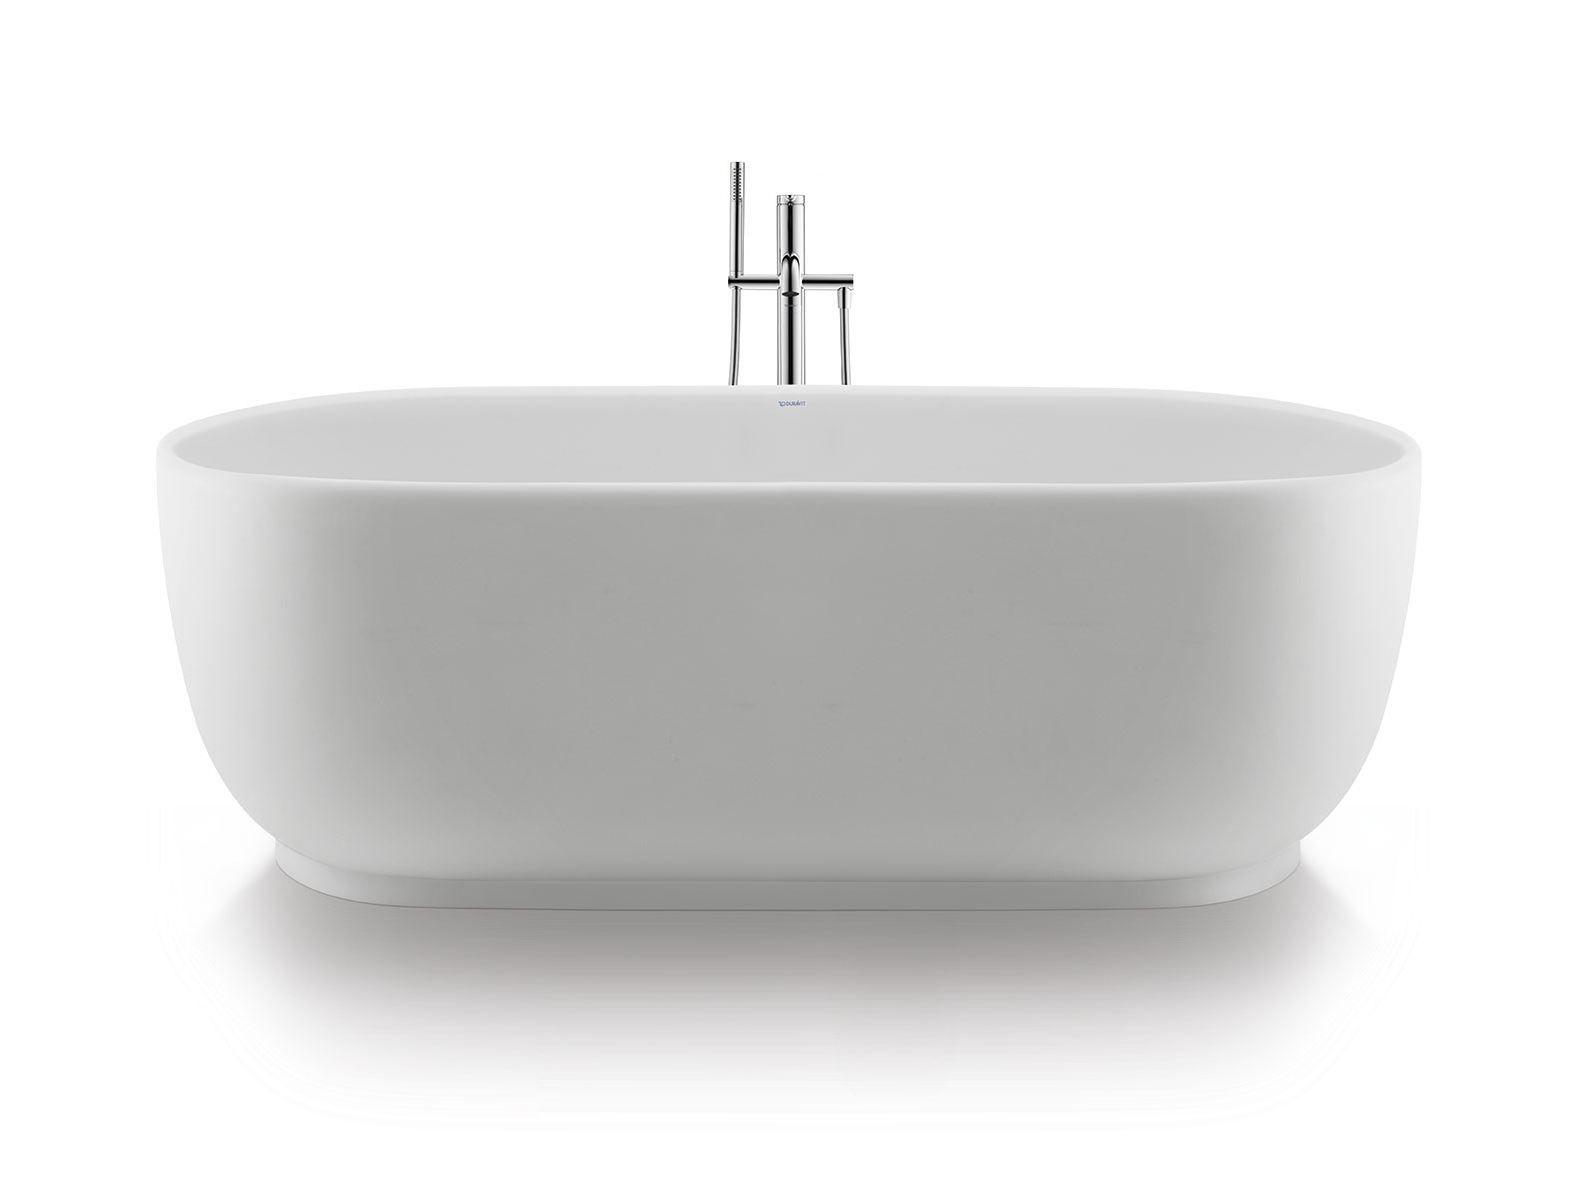 Image result for duravit luv tub | Sonoma | Pinterest | Duravit ...